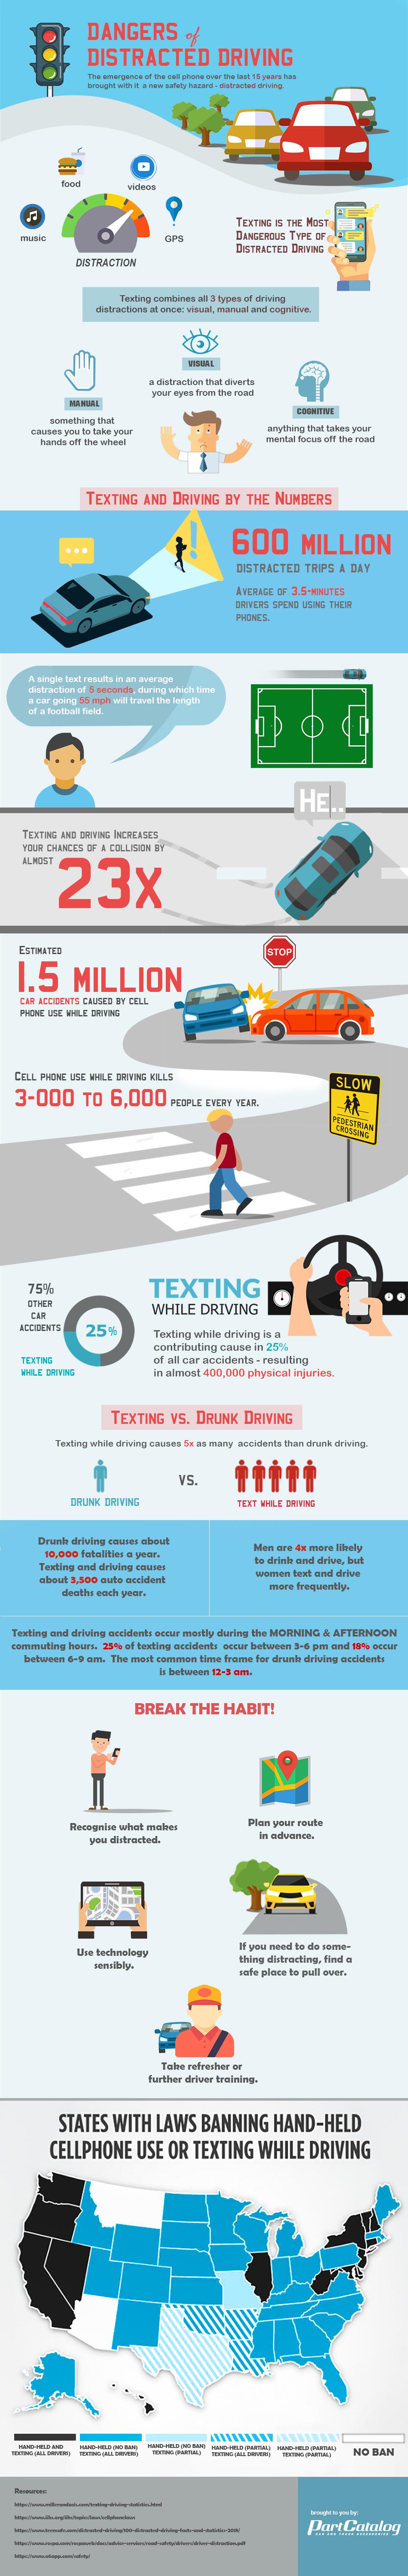 Dangers of Distracting driving infographics.jpg